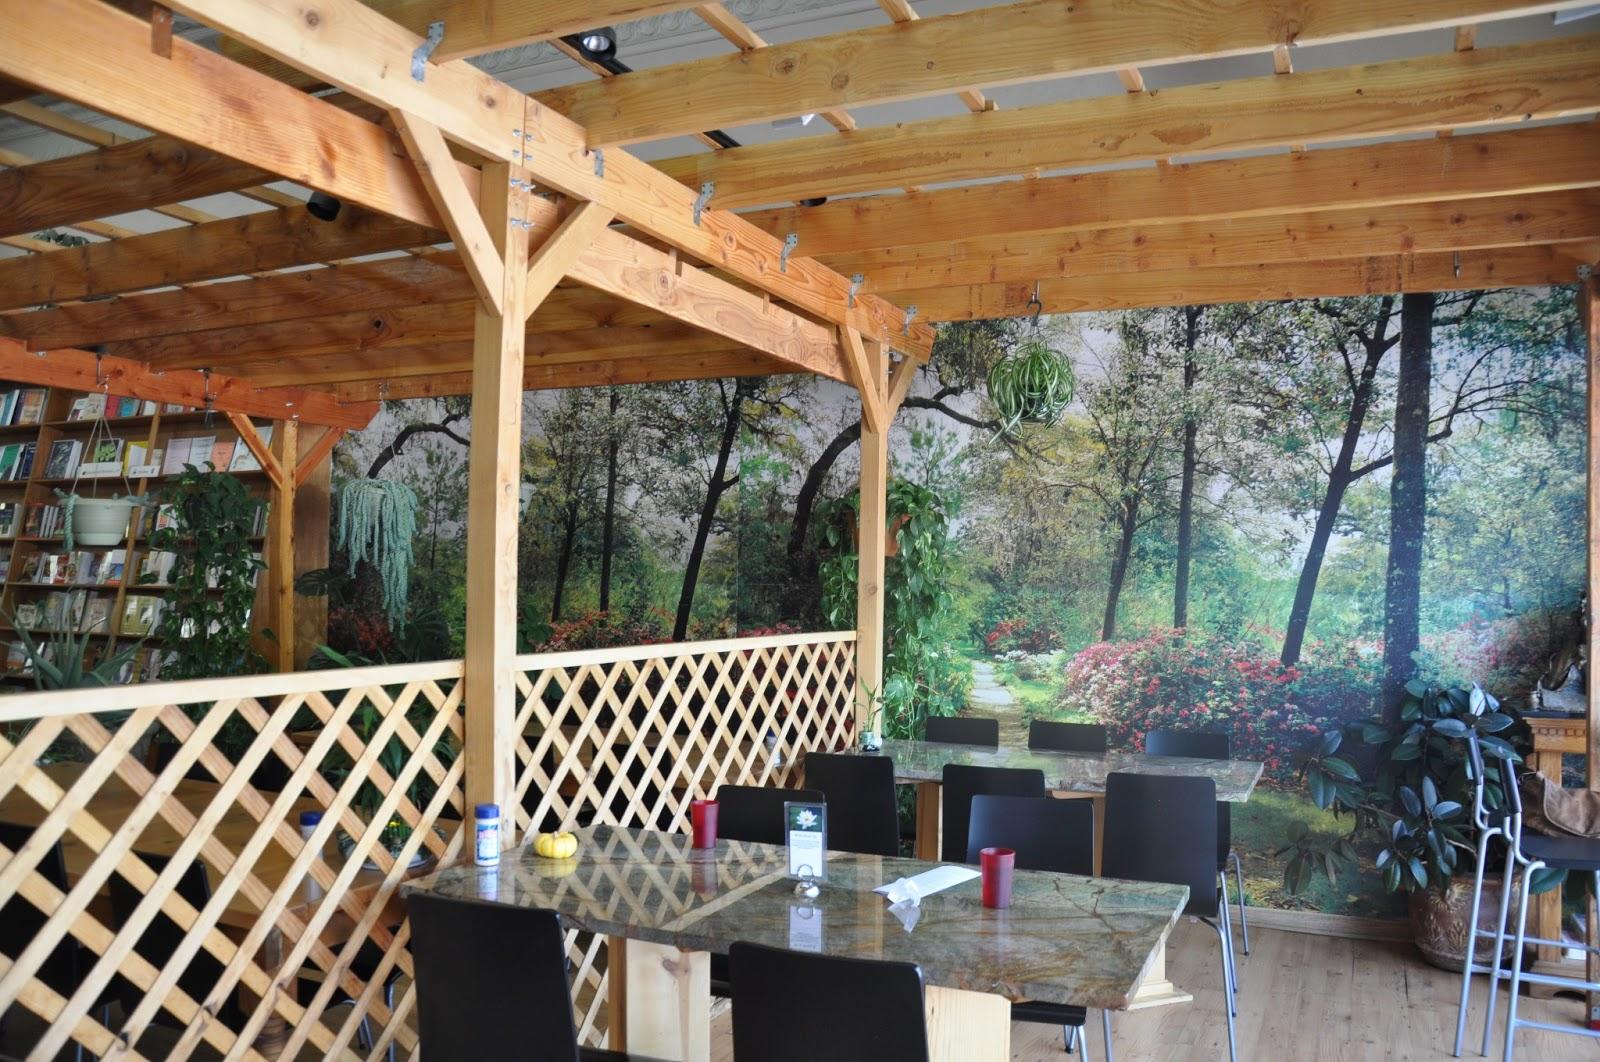 The interior of Ginger's Garden Cafe